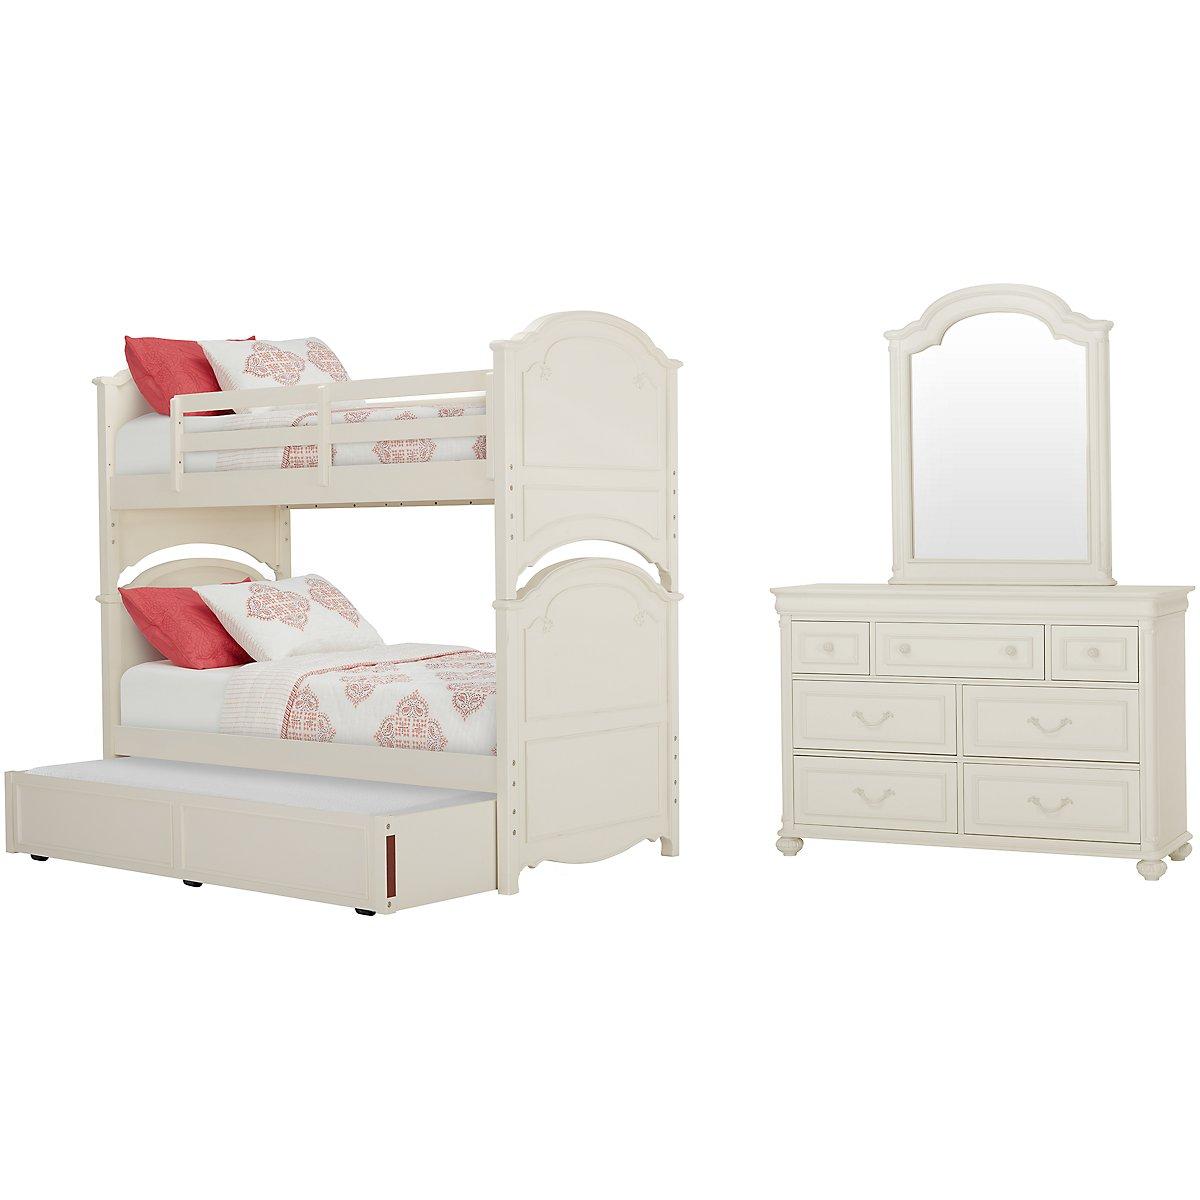 Charlotte Ivory Wood Bunk Bed Trundle Bedroom